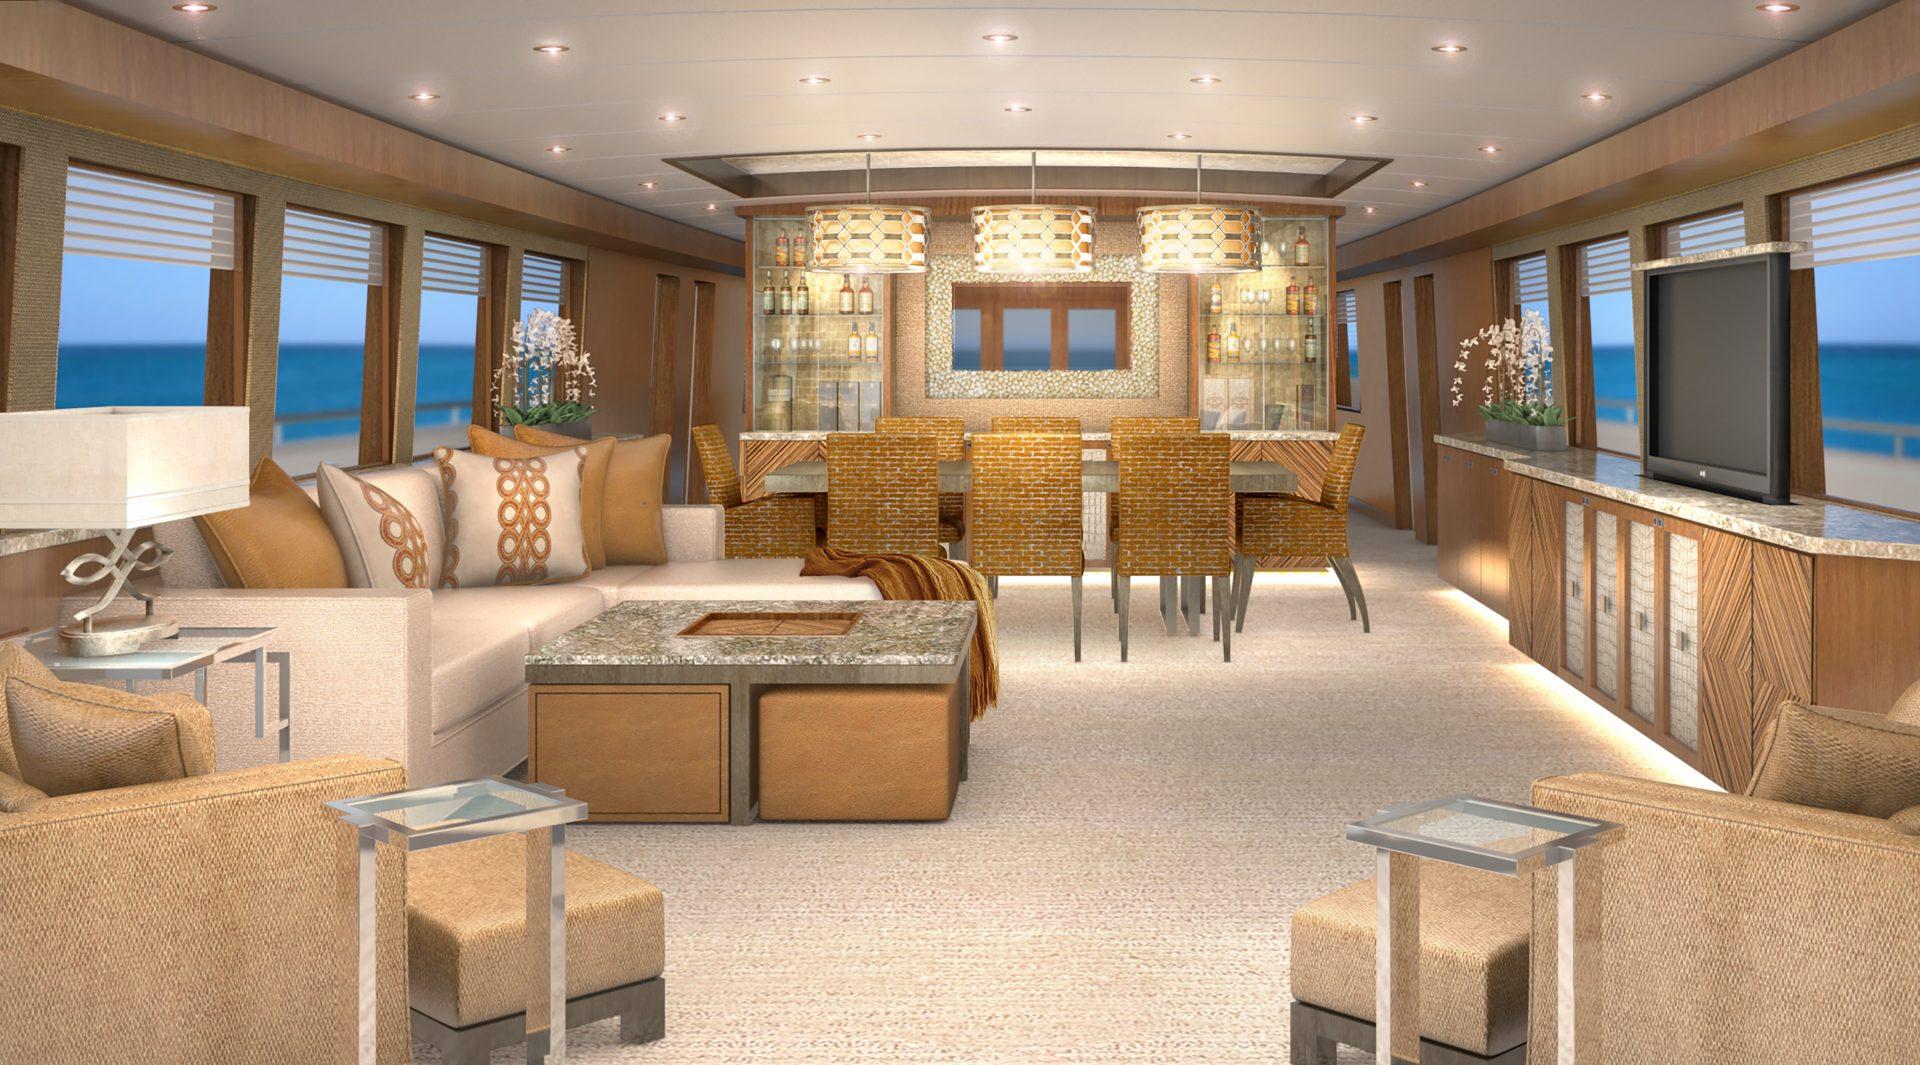 Karen Lynne Interior Design